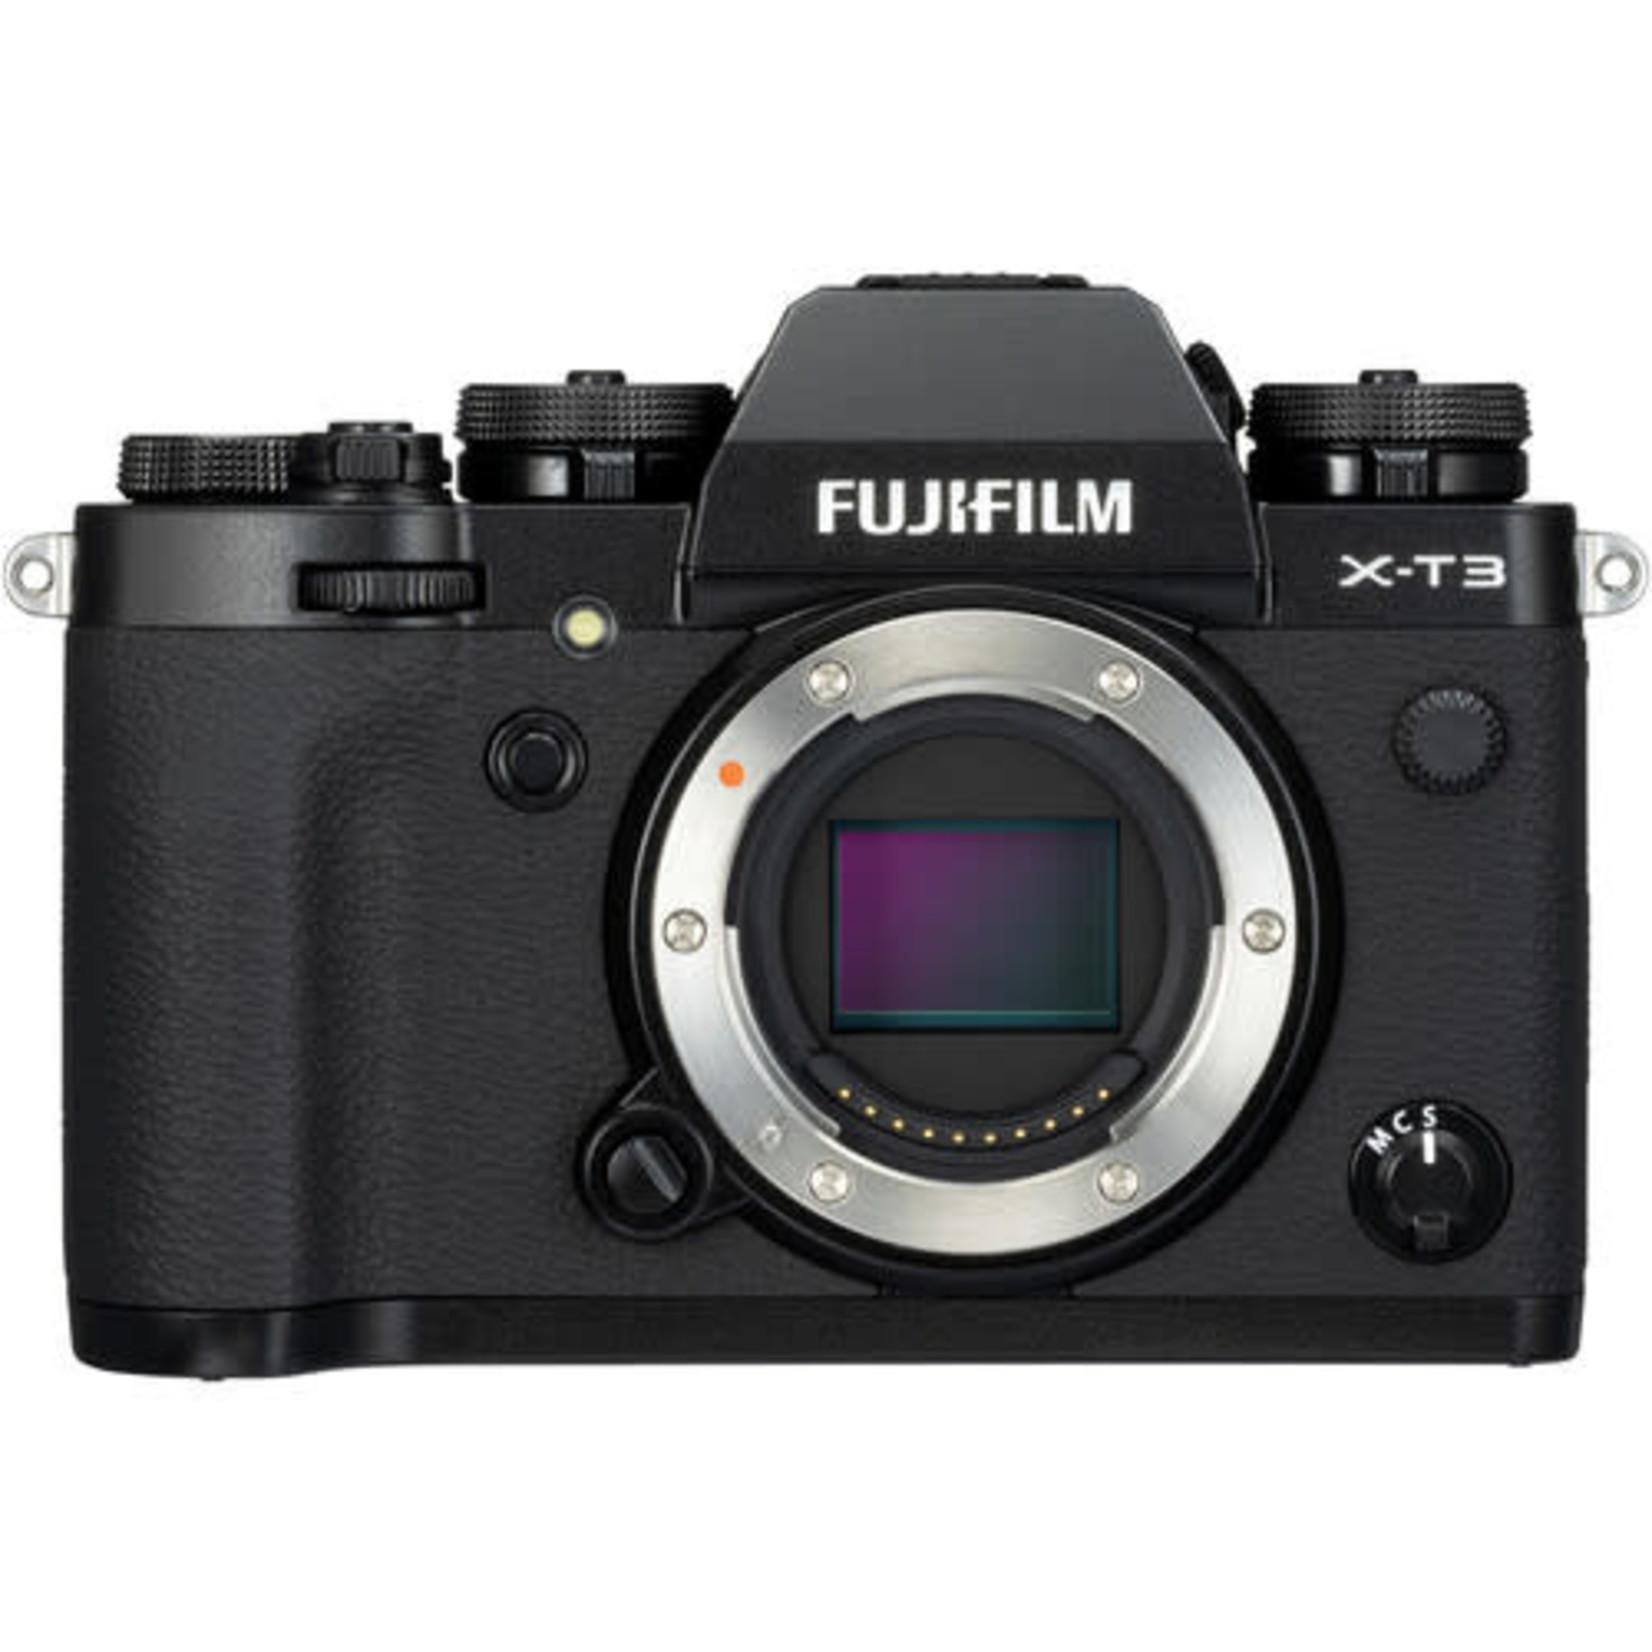 FujiFilm FUJIFILM X-T3 WW Mirrorless Digital Camera (Body Only, Black)